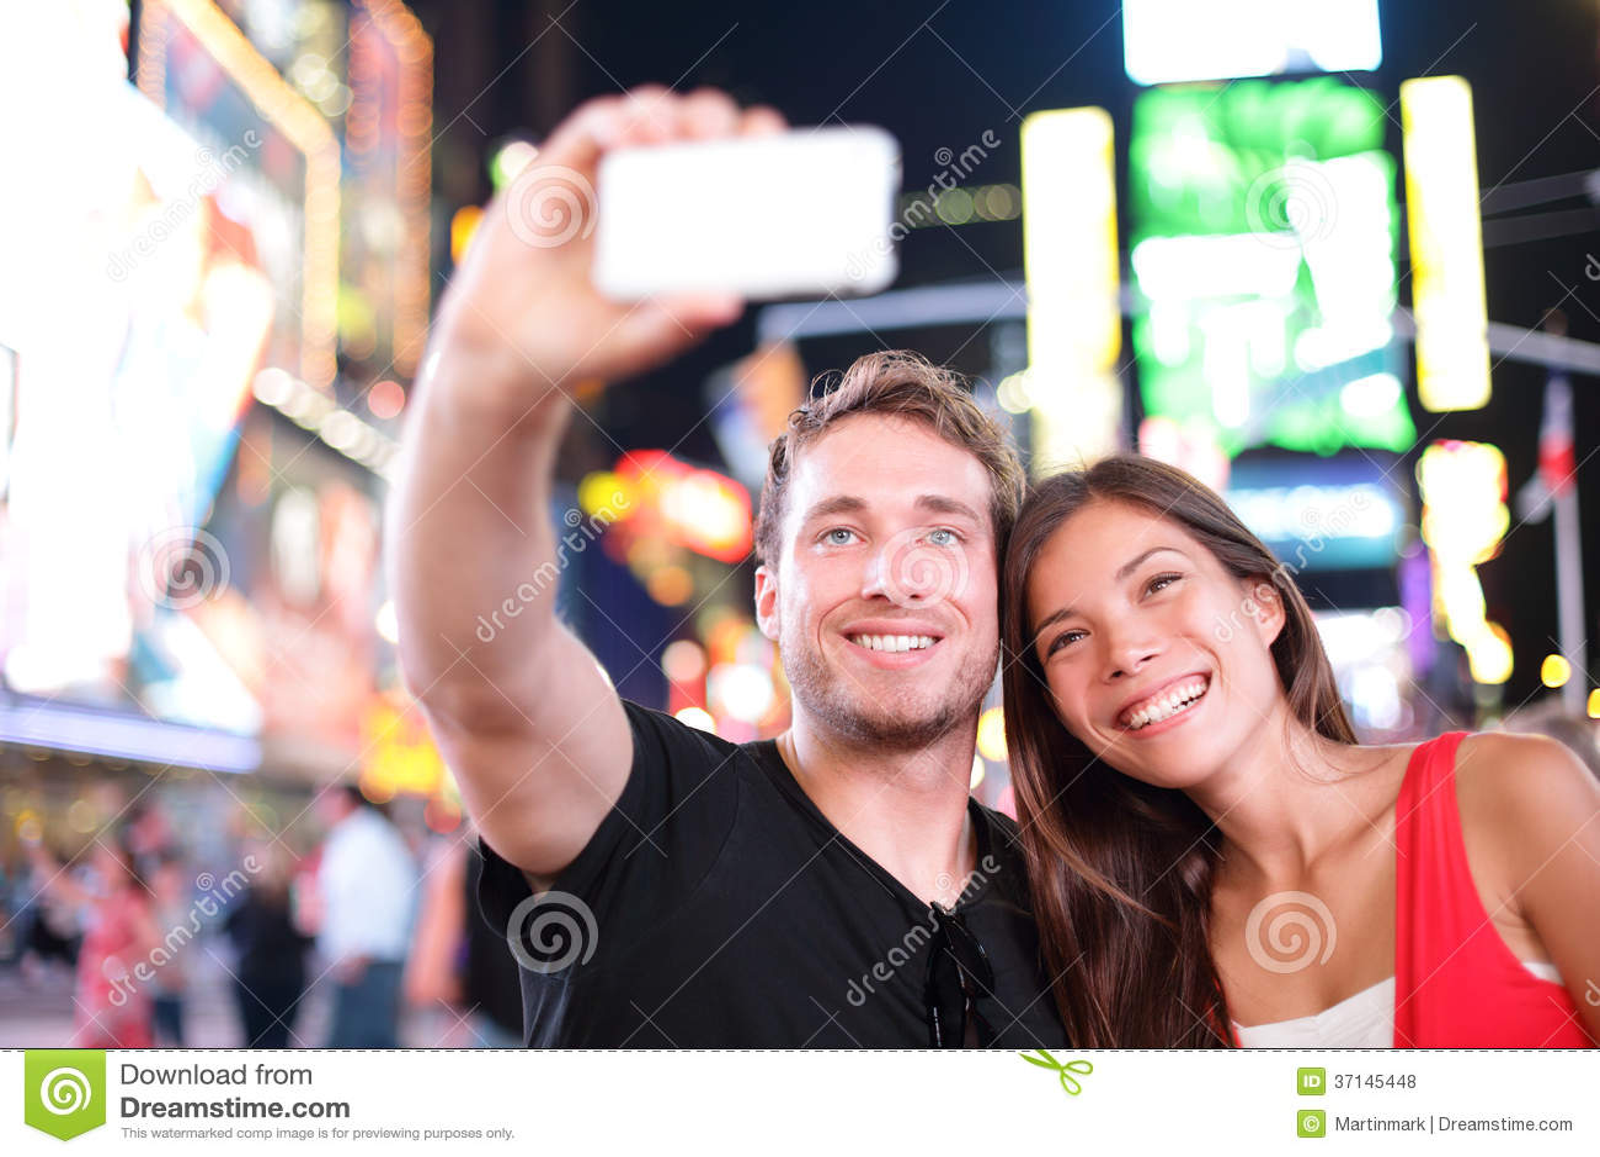 Dating tourists